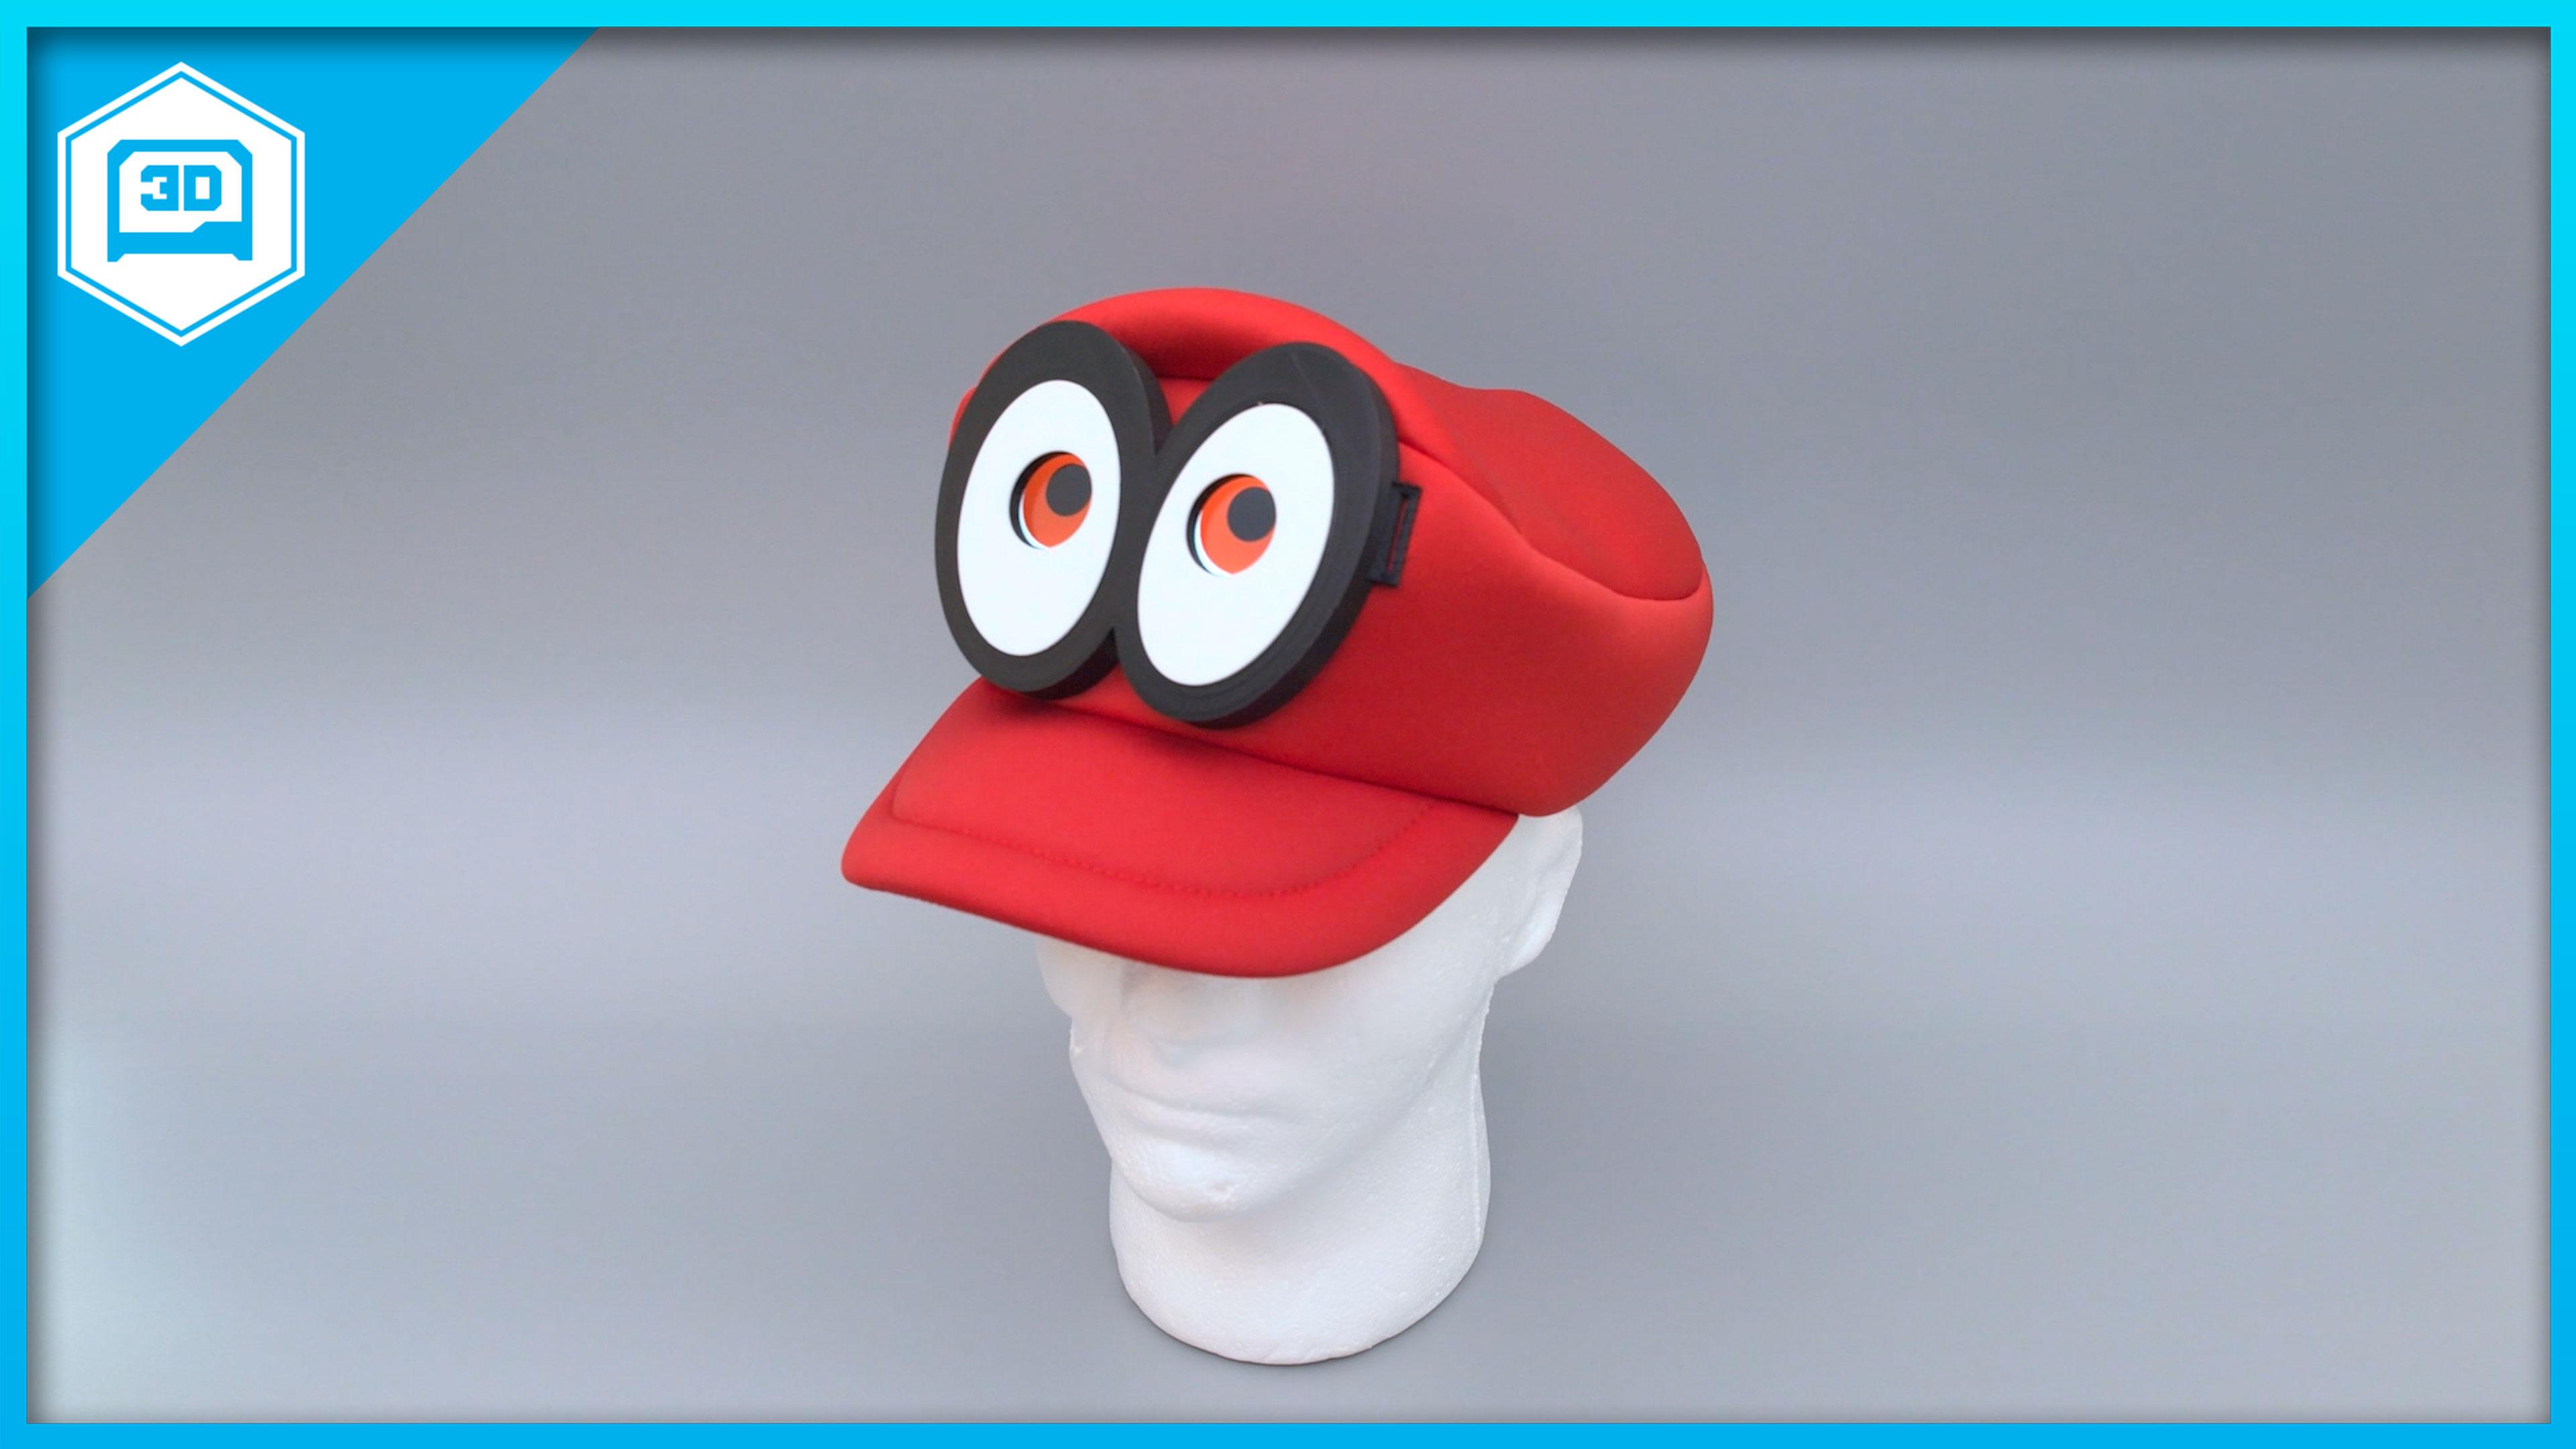 cappy-thumb.jpg Télécharger fichier STL gratuit Mario Cappy Chapeau Animated Eyes Animated Eyes • Objet imprimable en 3D, Adafruit